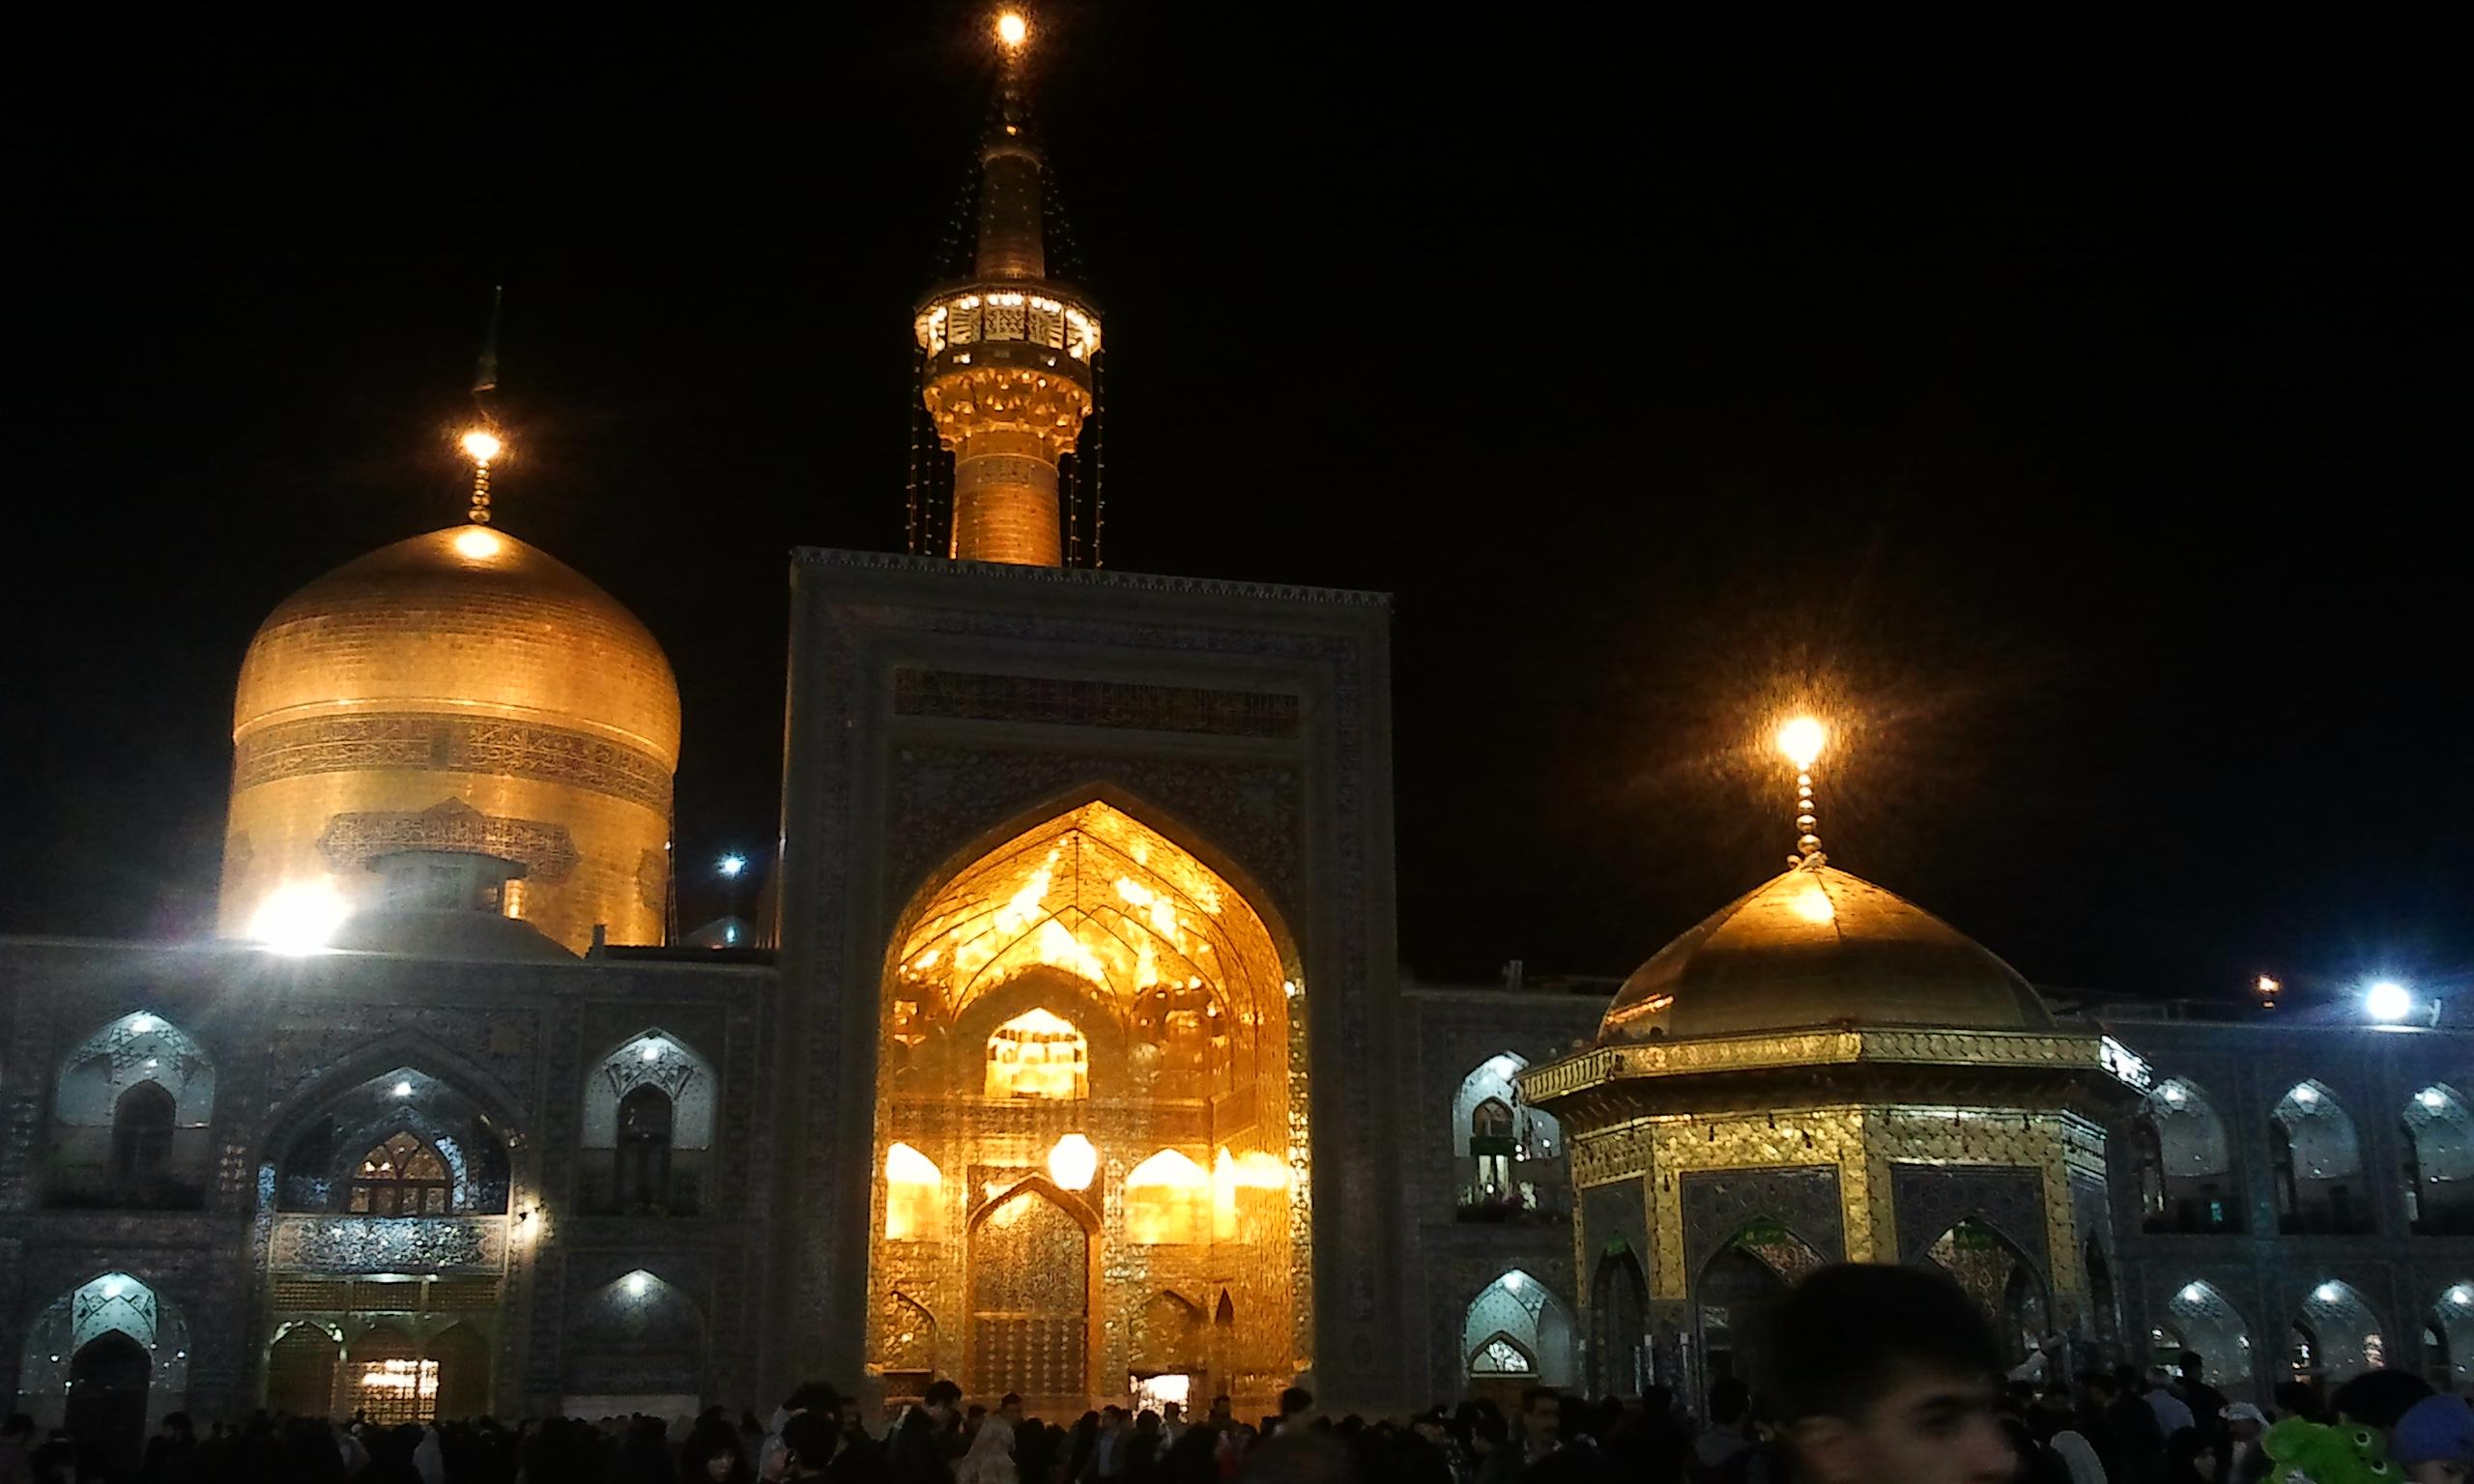 imam_reza_holy_shrine_by_meysam110-d7sgv